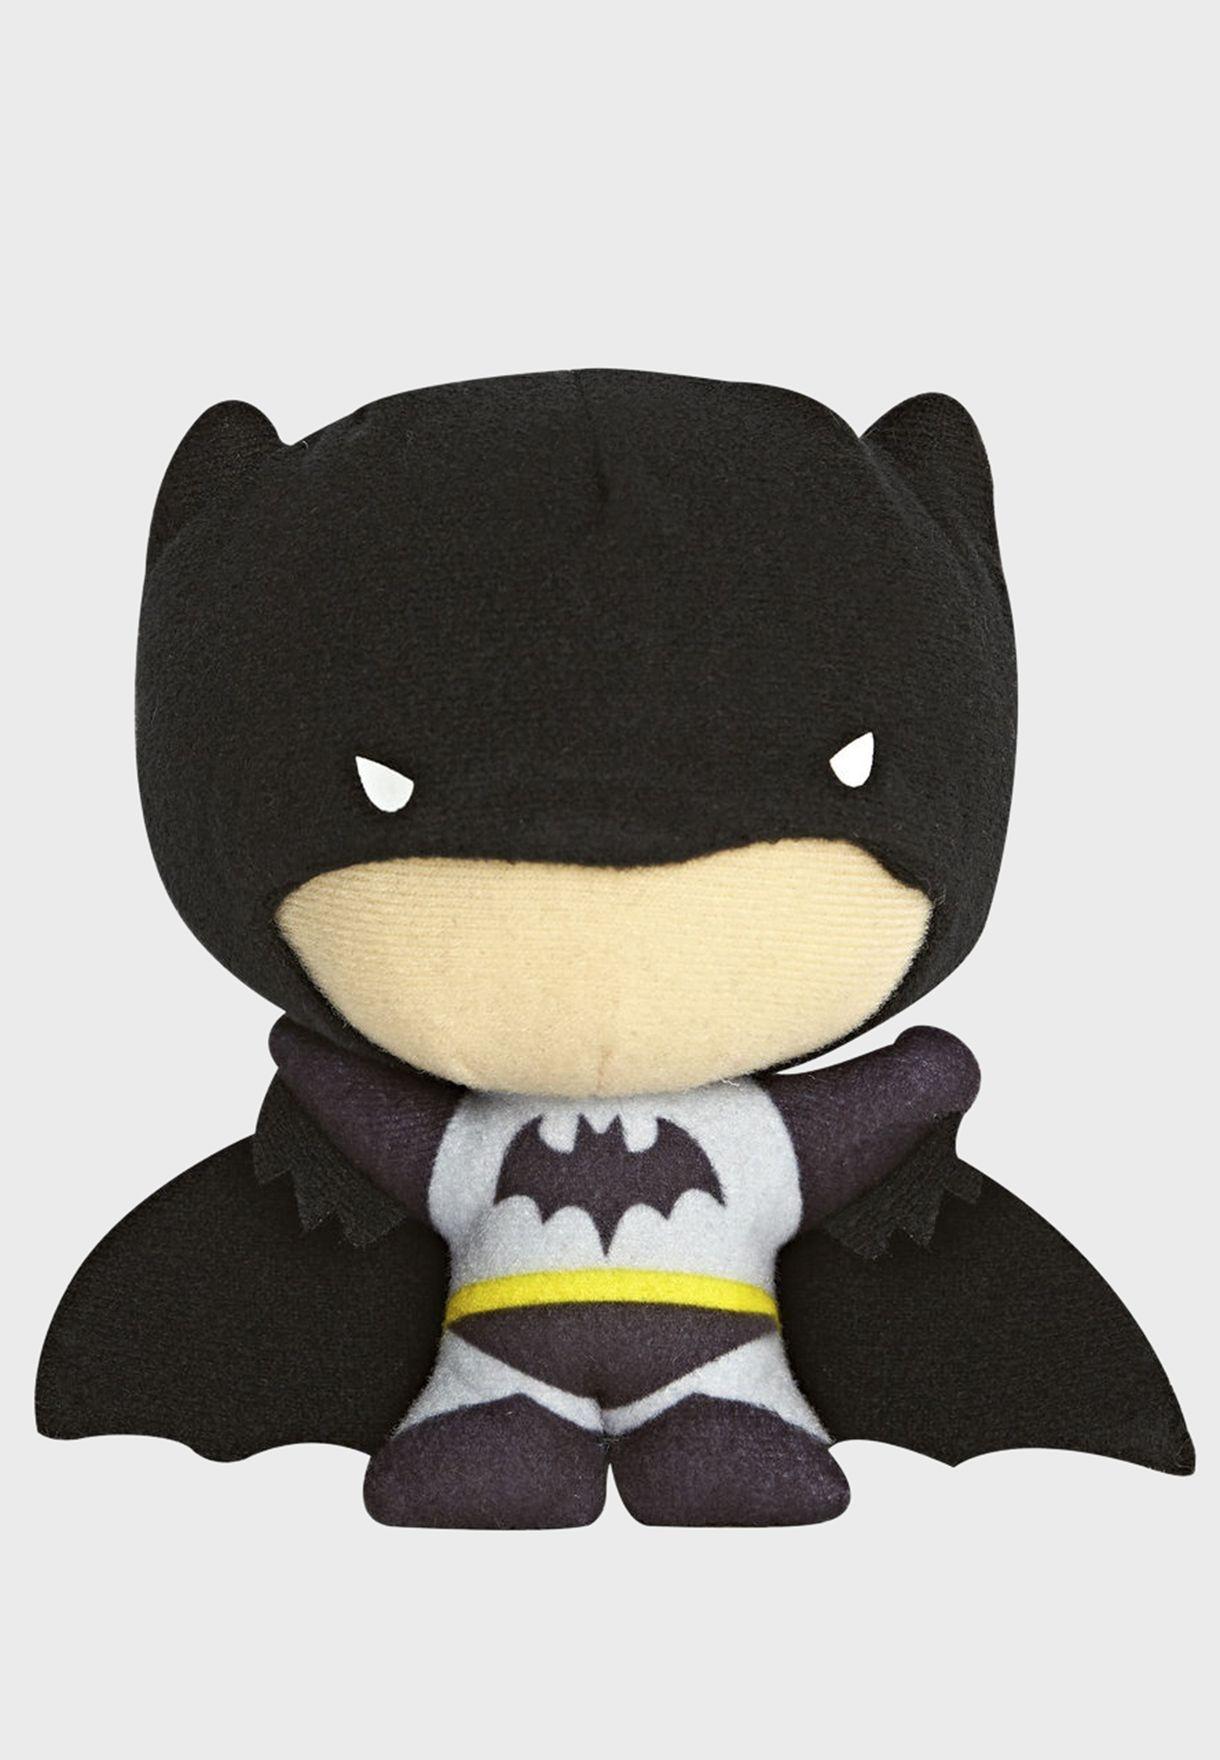 Batman Soaker Toy